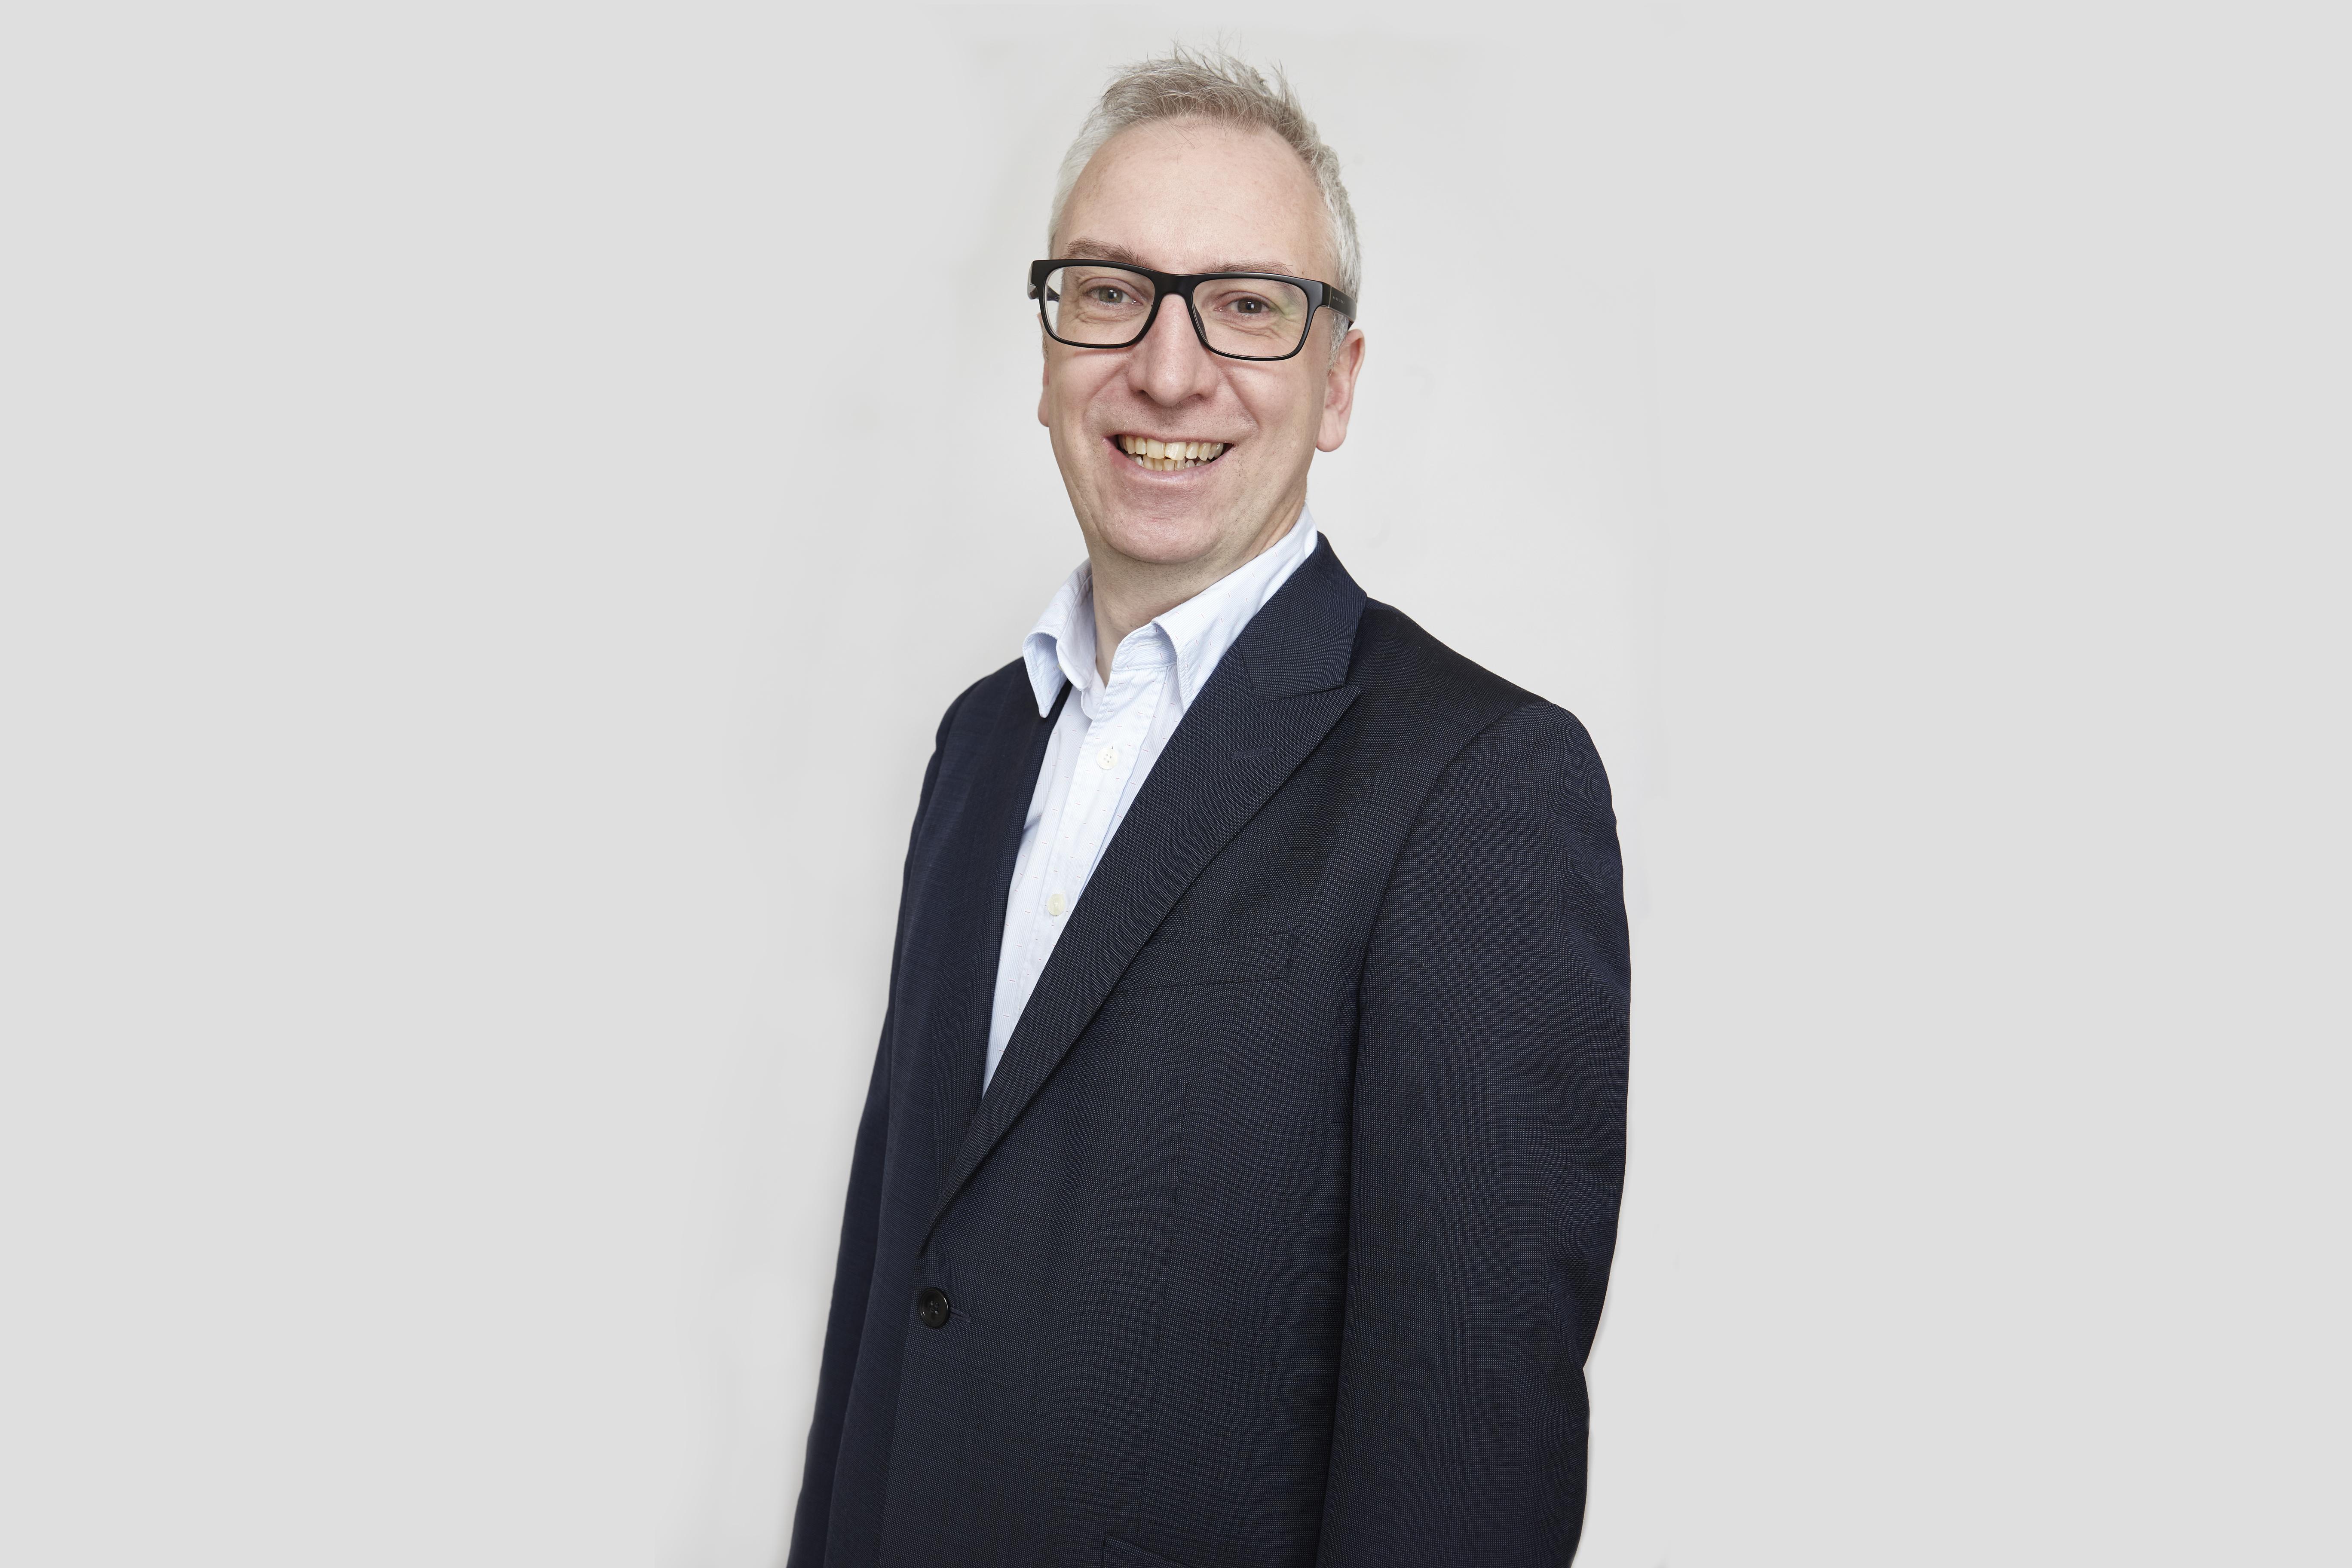 Bill Lines, Director